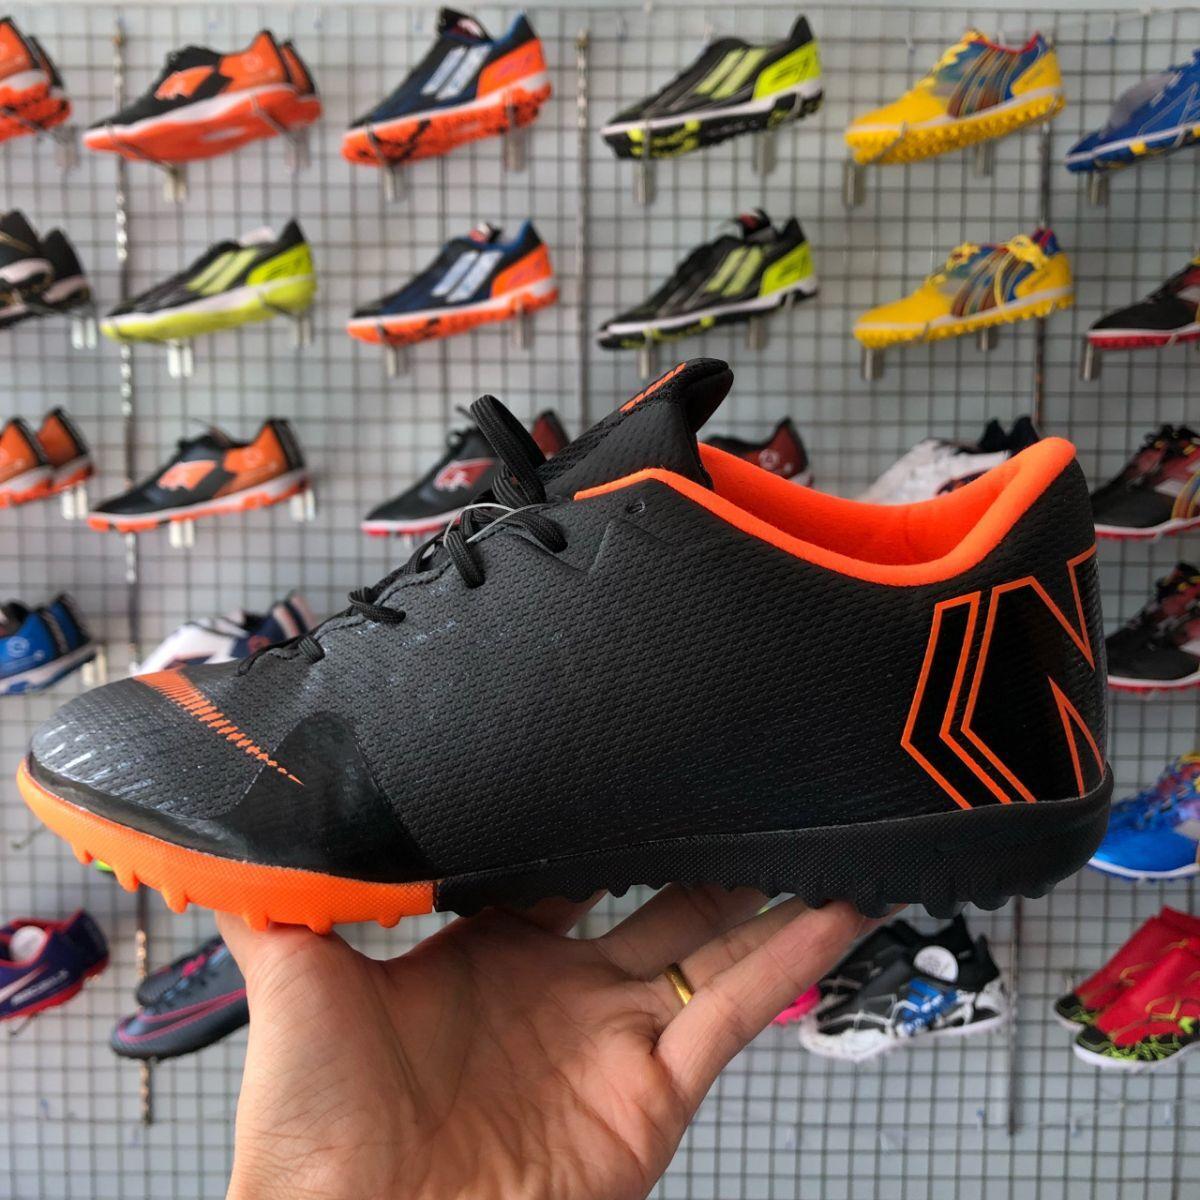 b2c6fcb15a6 Giày Nike Mercurial Vapor 12 (TF) Đen (Fake1)